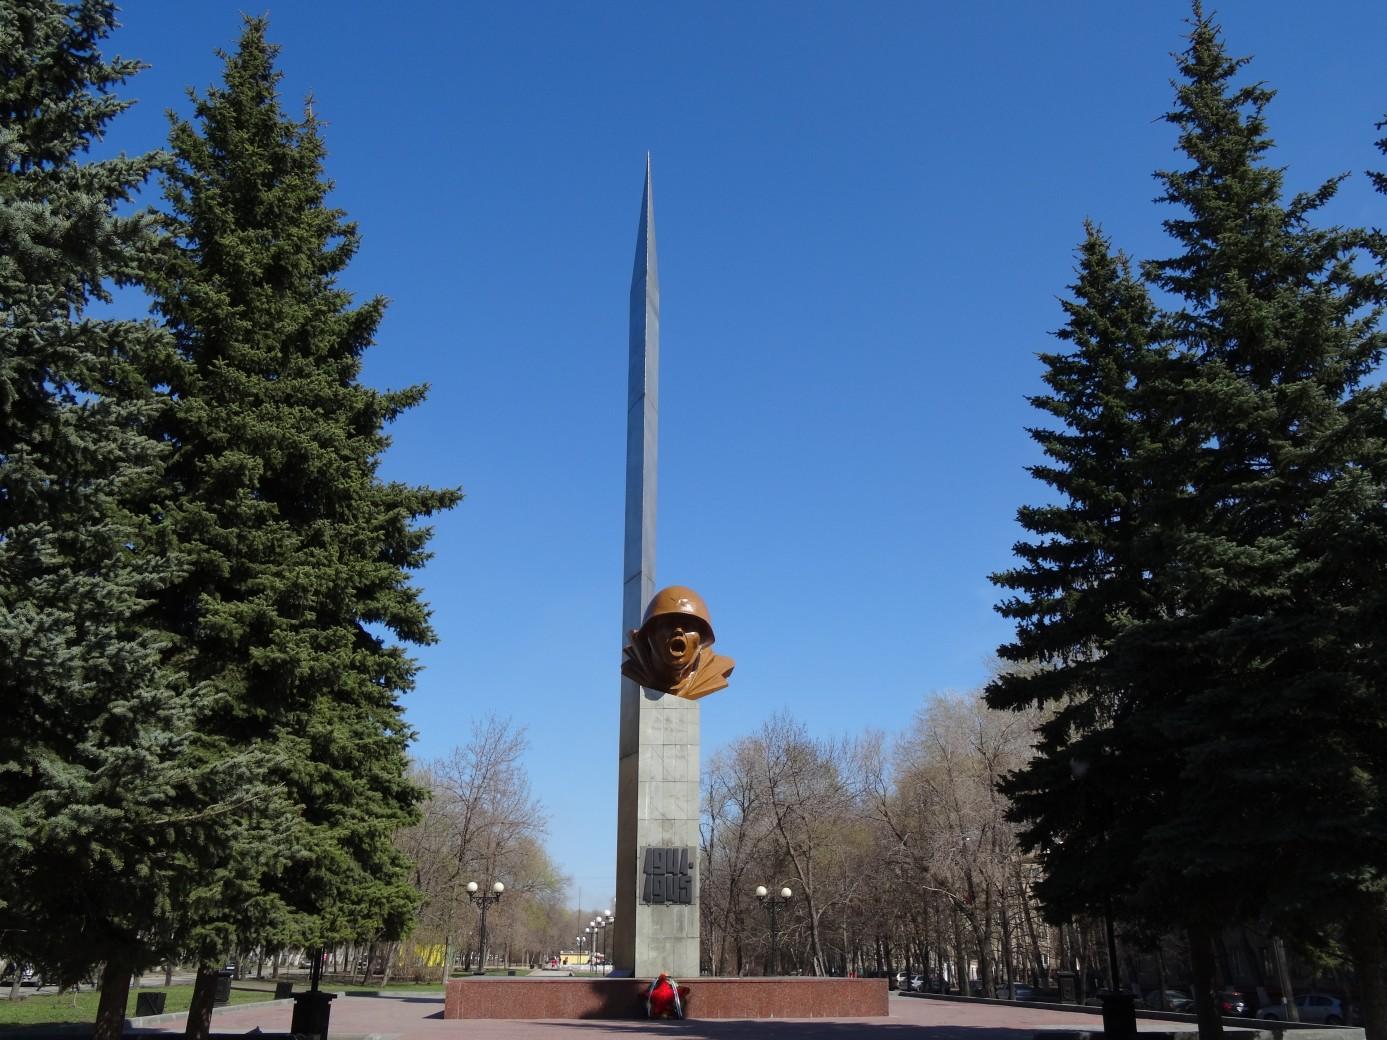 Шлюхи челябинска чмз 5 фотография